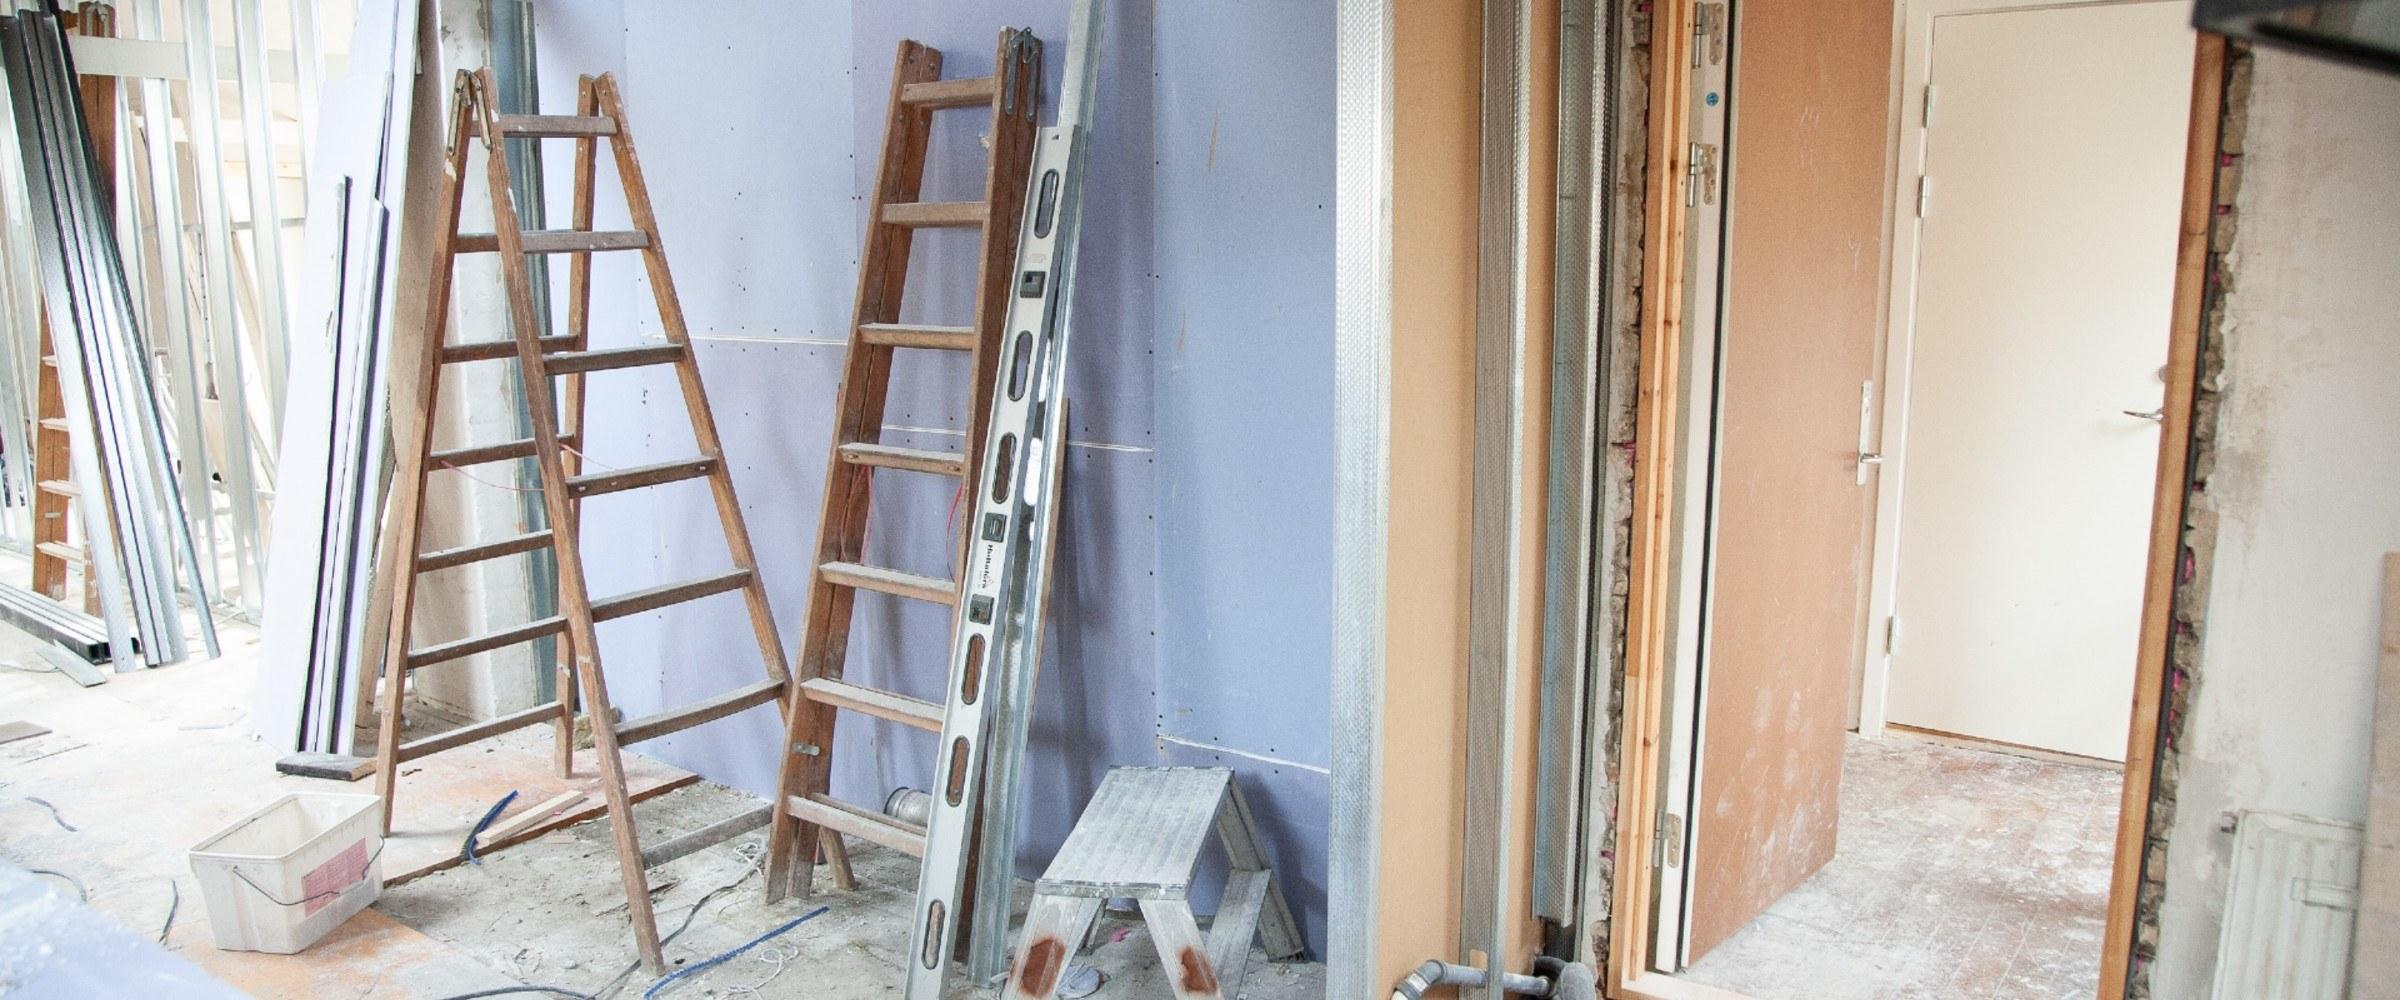 home flipping process in Philadelphia